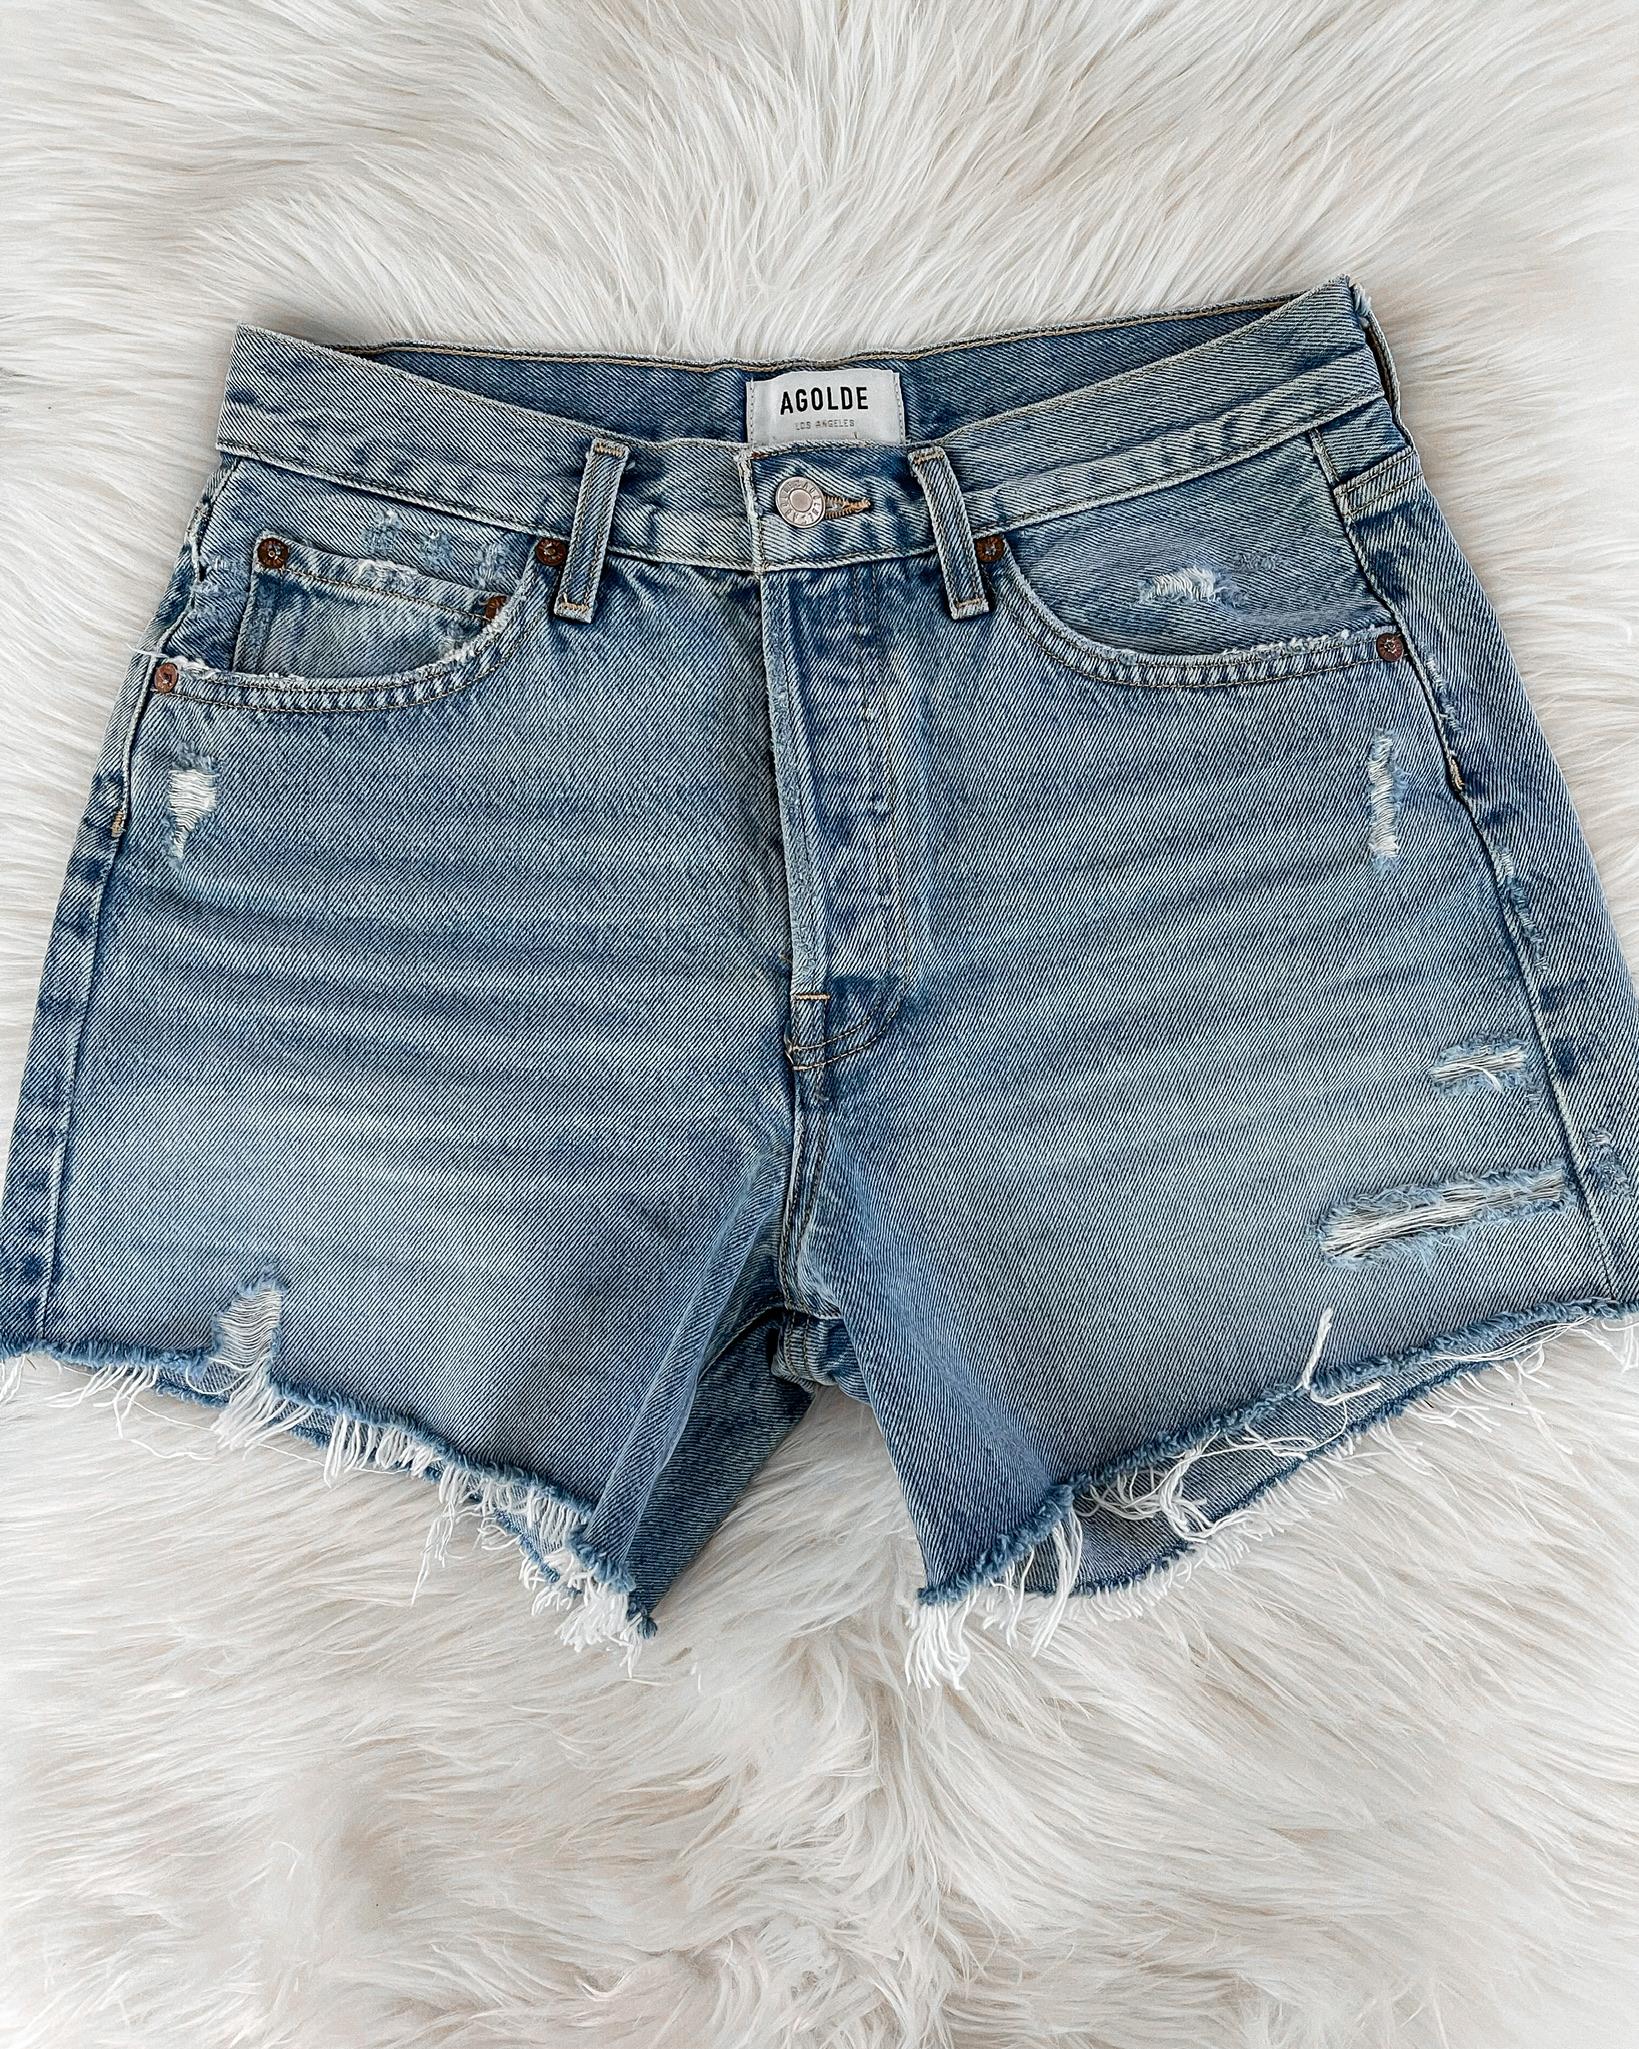 Fashion Jackson AGOLDE Parker Long Shorts